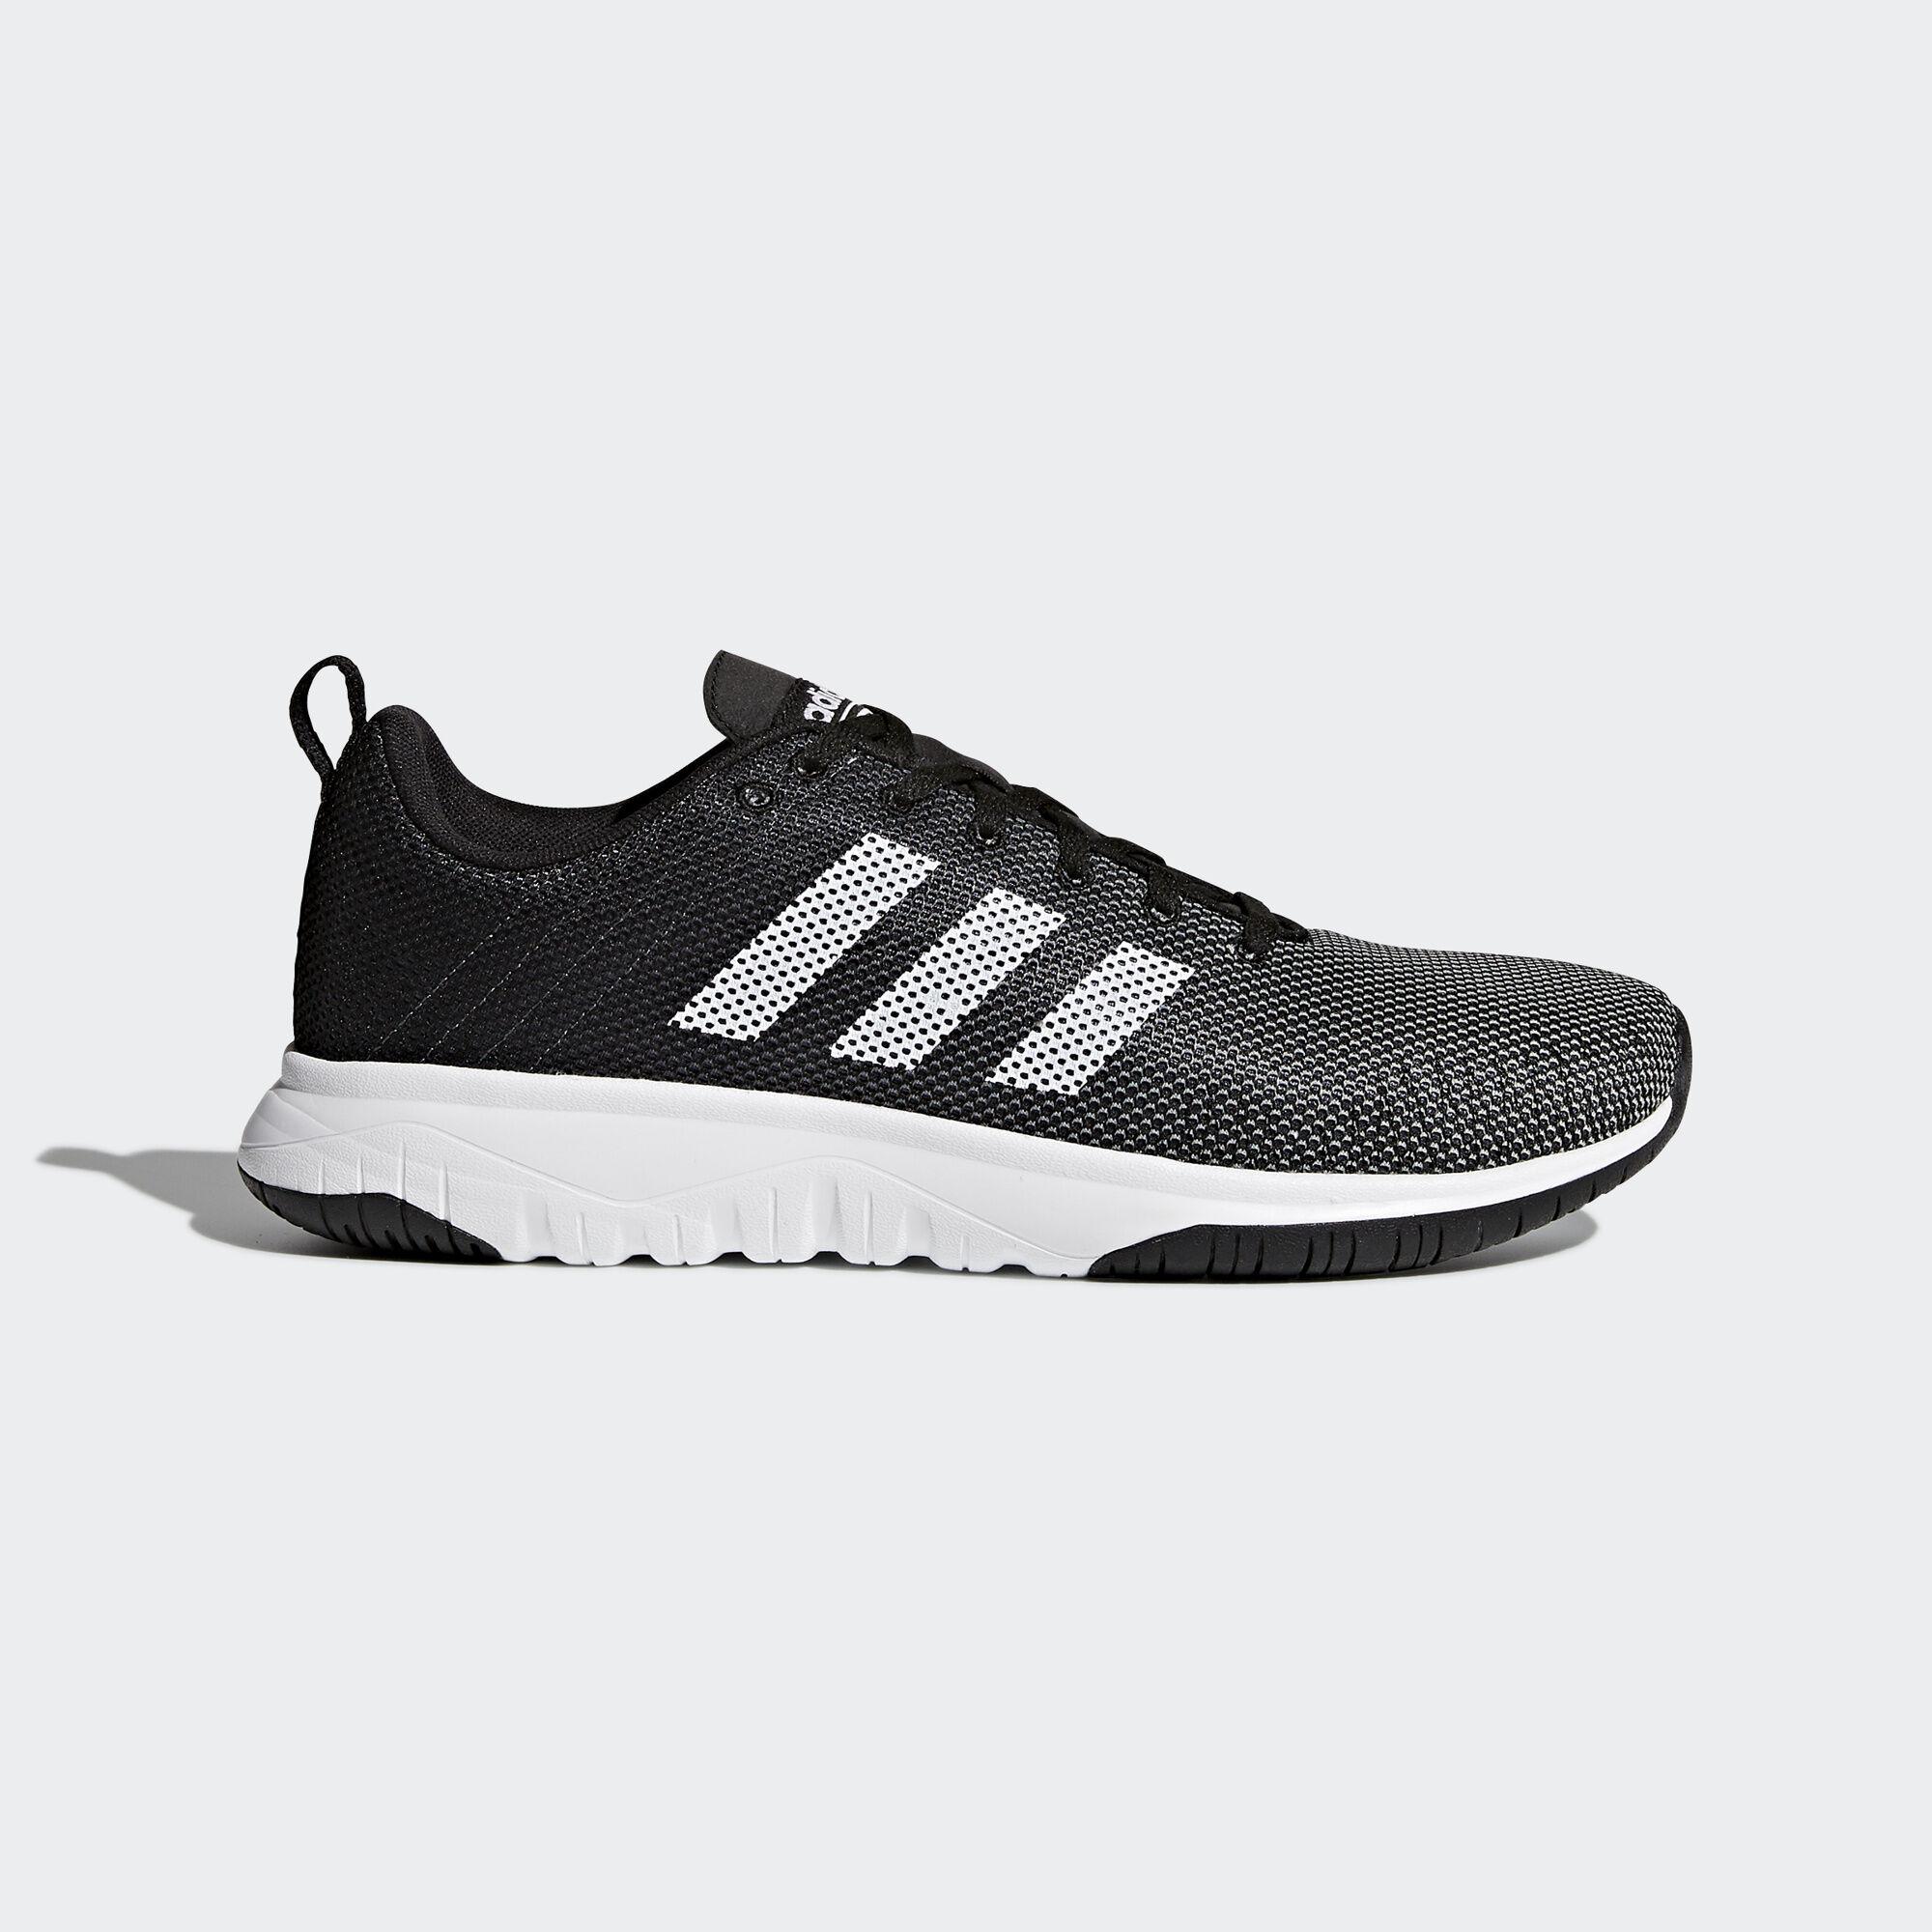 Adidas Neo Mid Cut